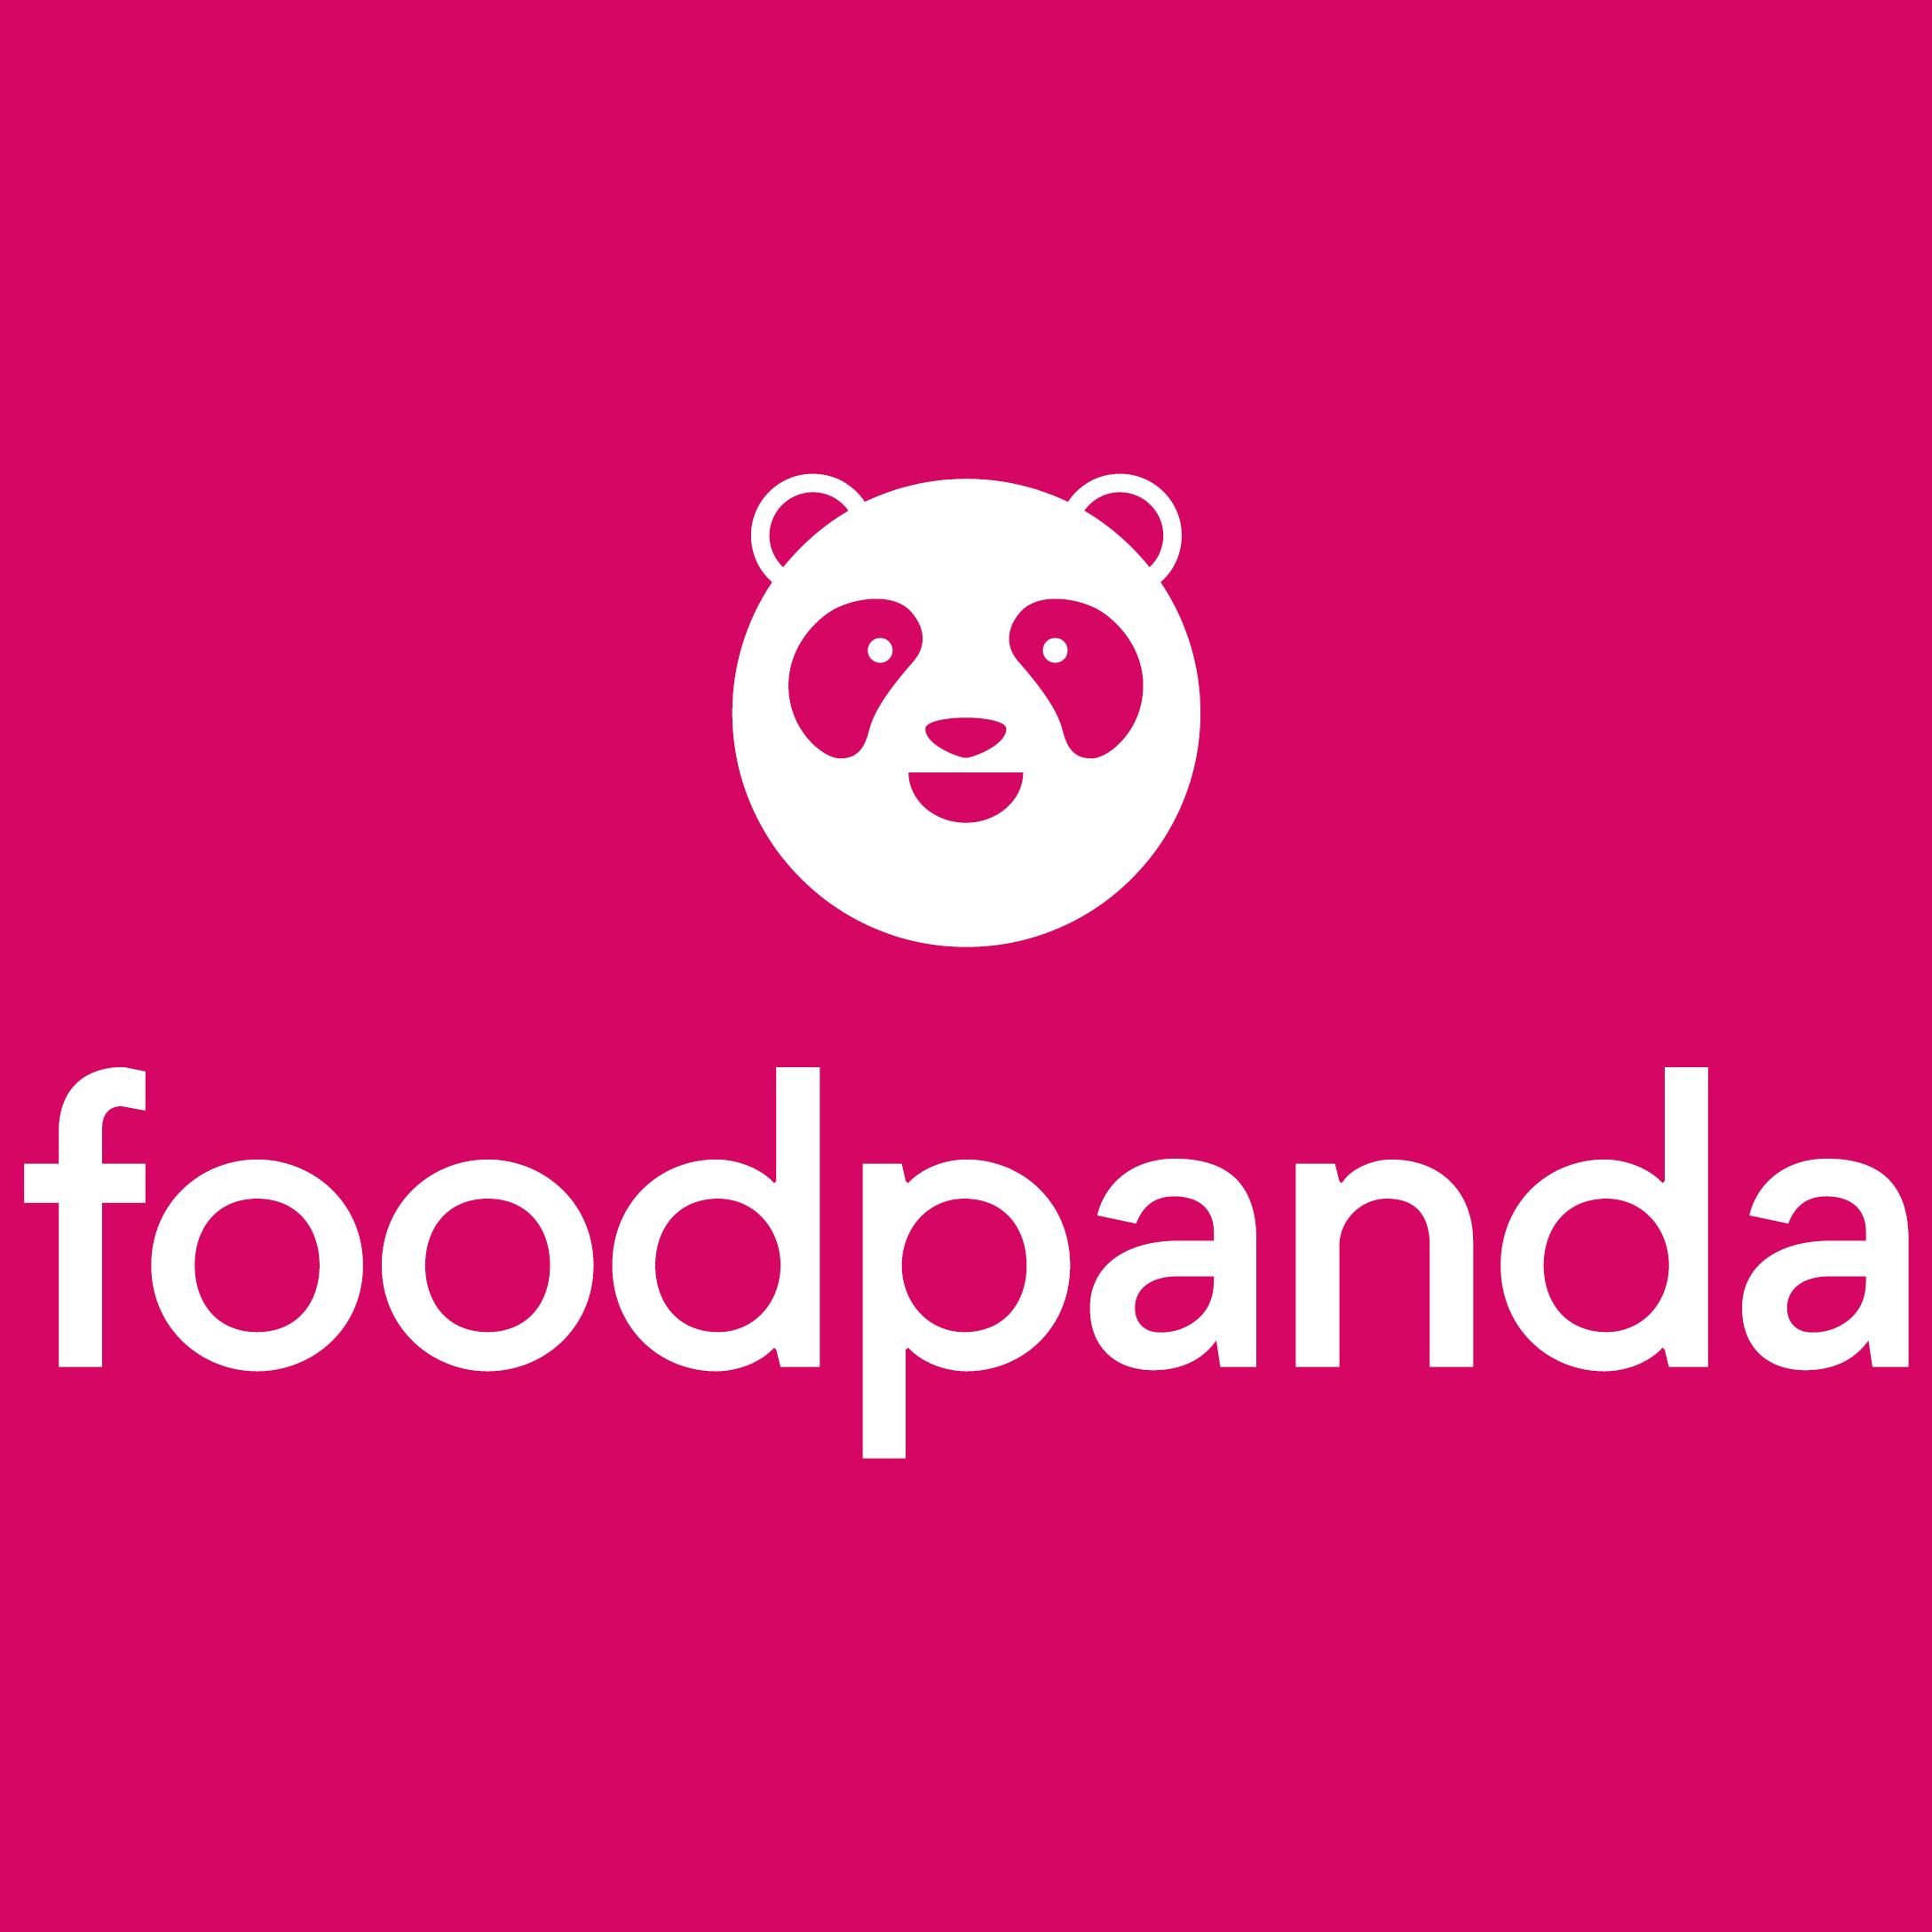 foodpandaデリバリーサービス始めました